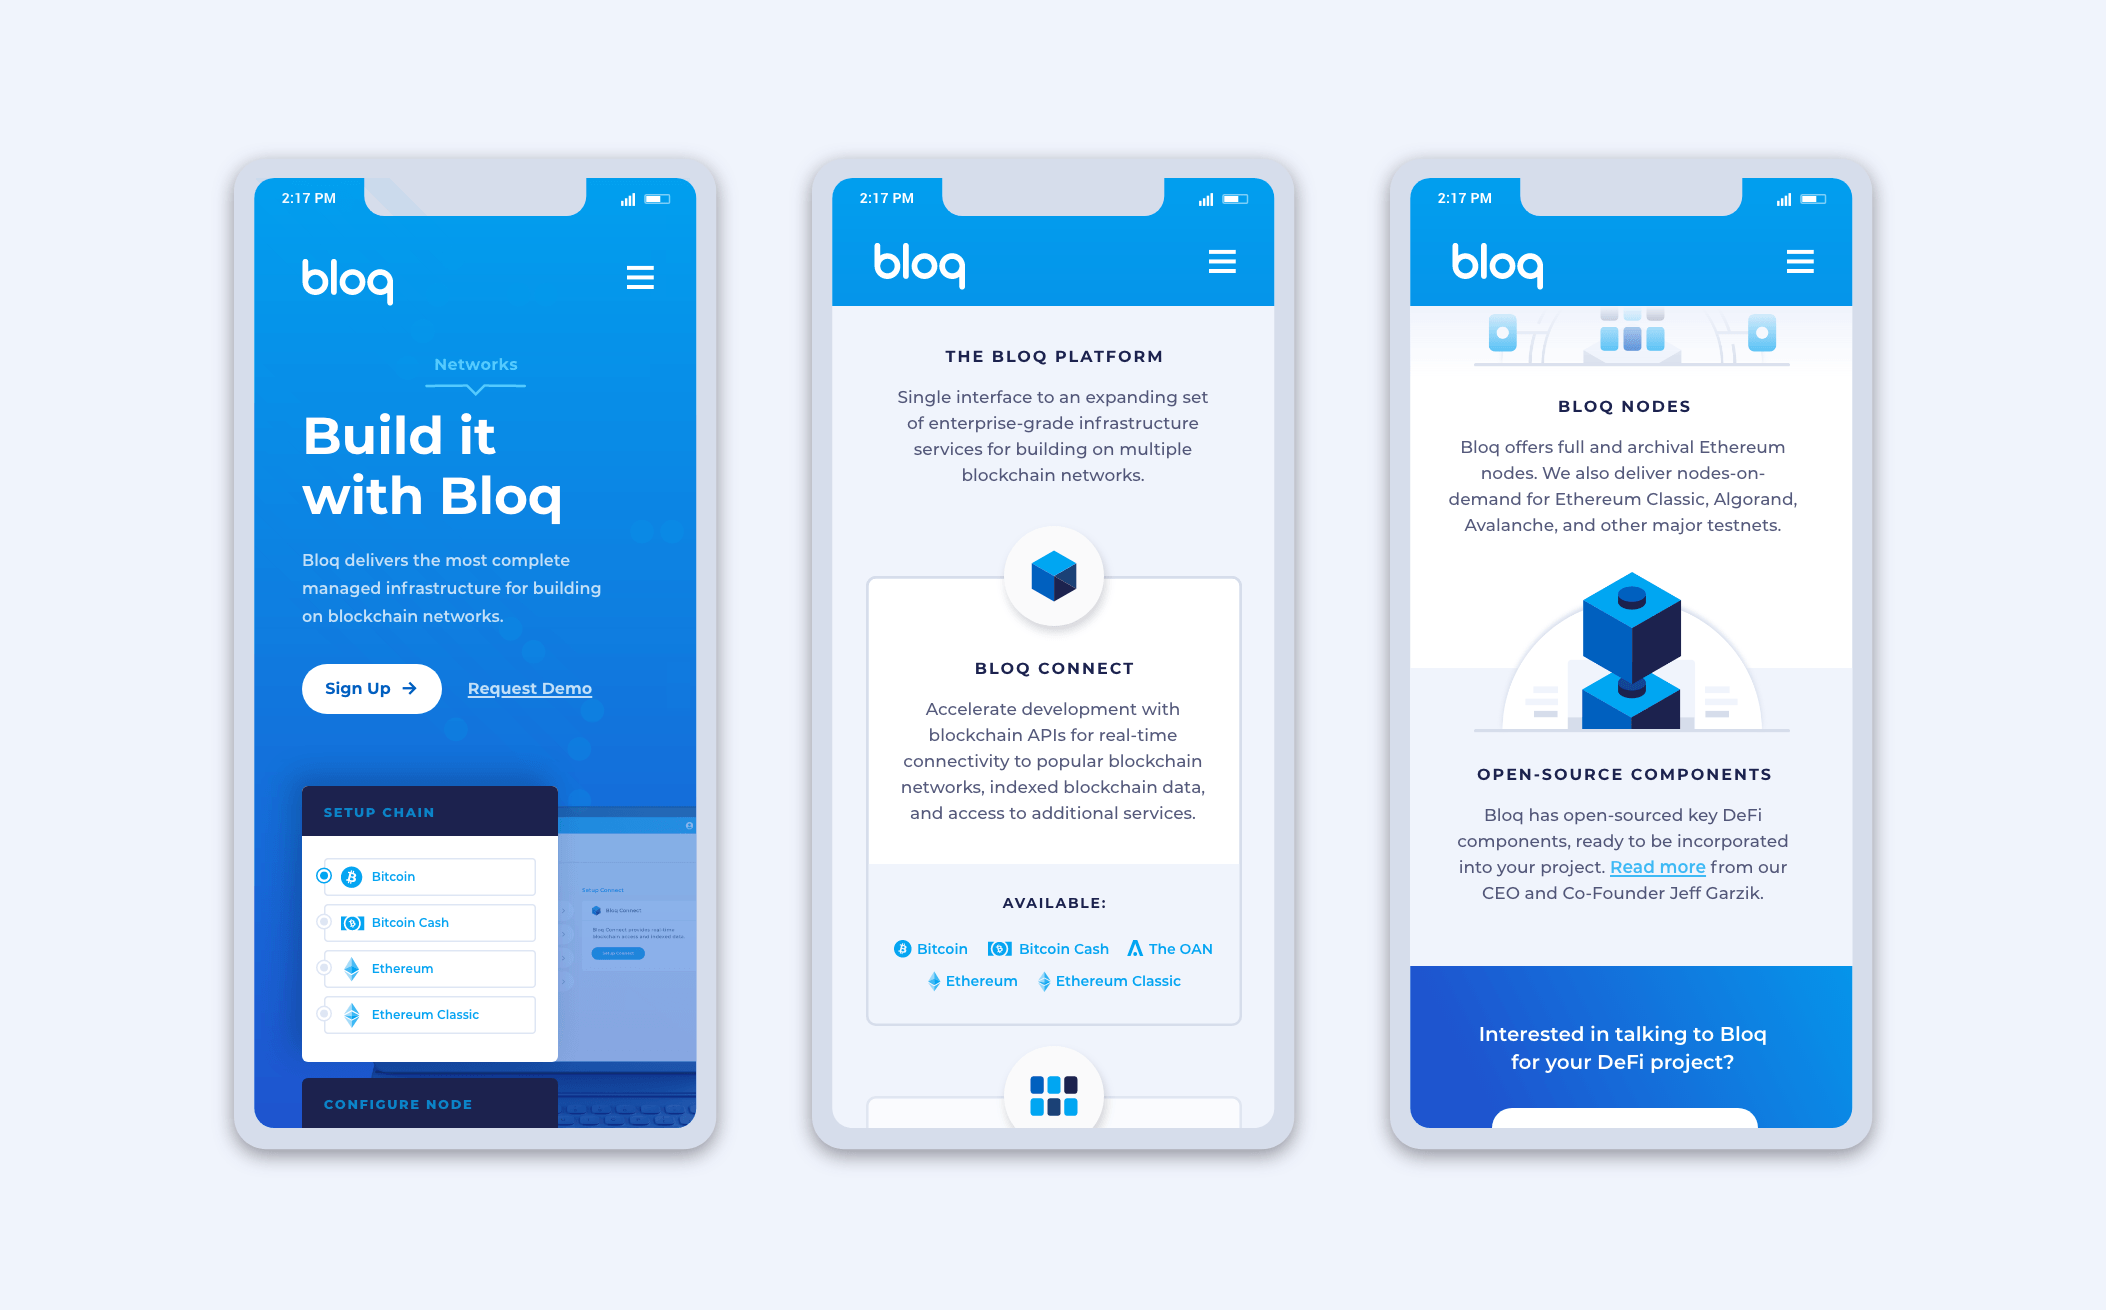 bloq mobile website previews